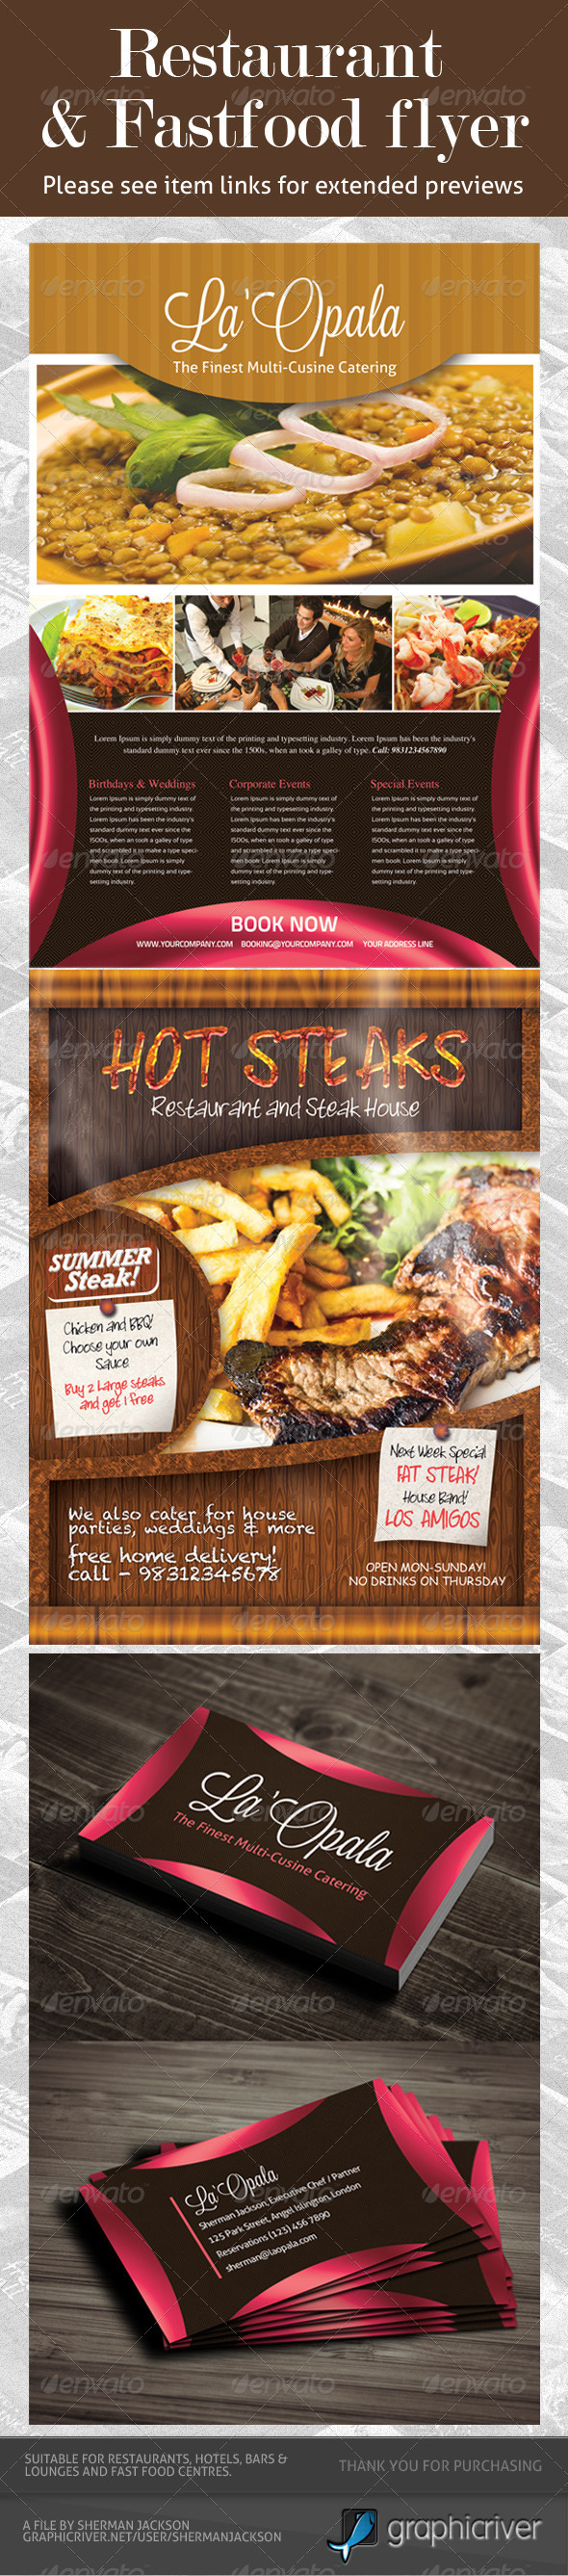 Restaurant & Fast Food Flyer PSD Template Bundle - Restaurant Flyers